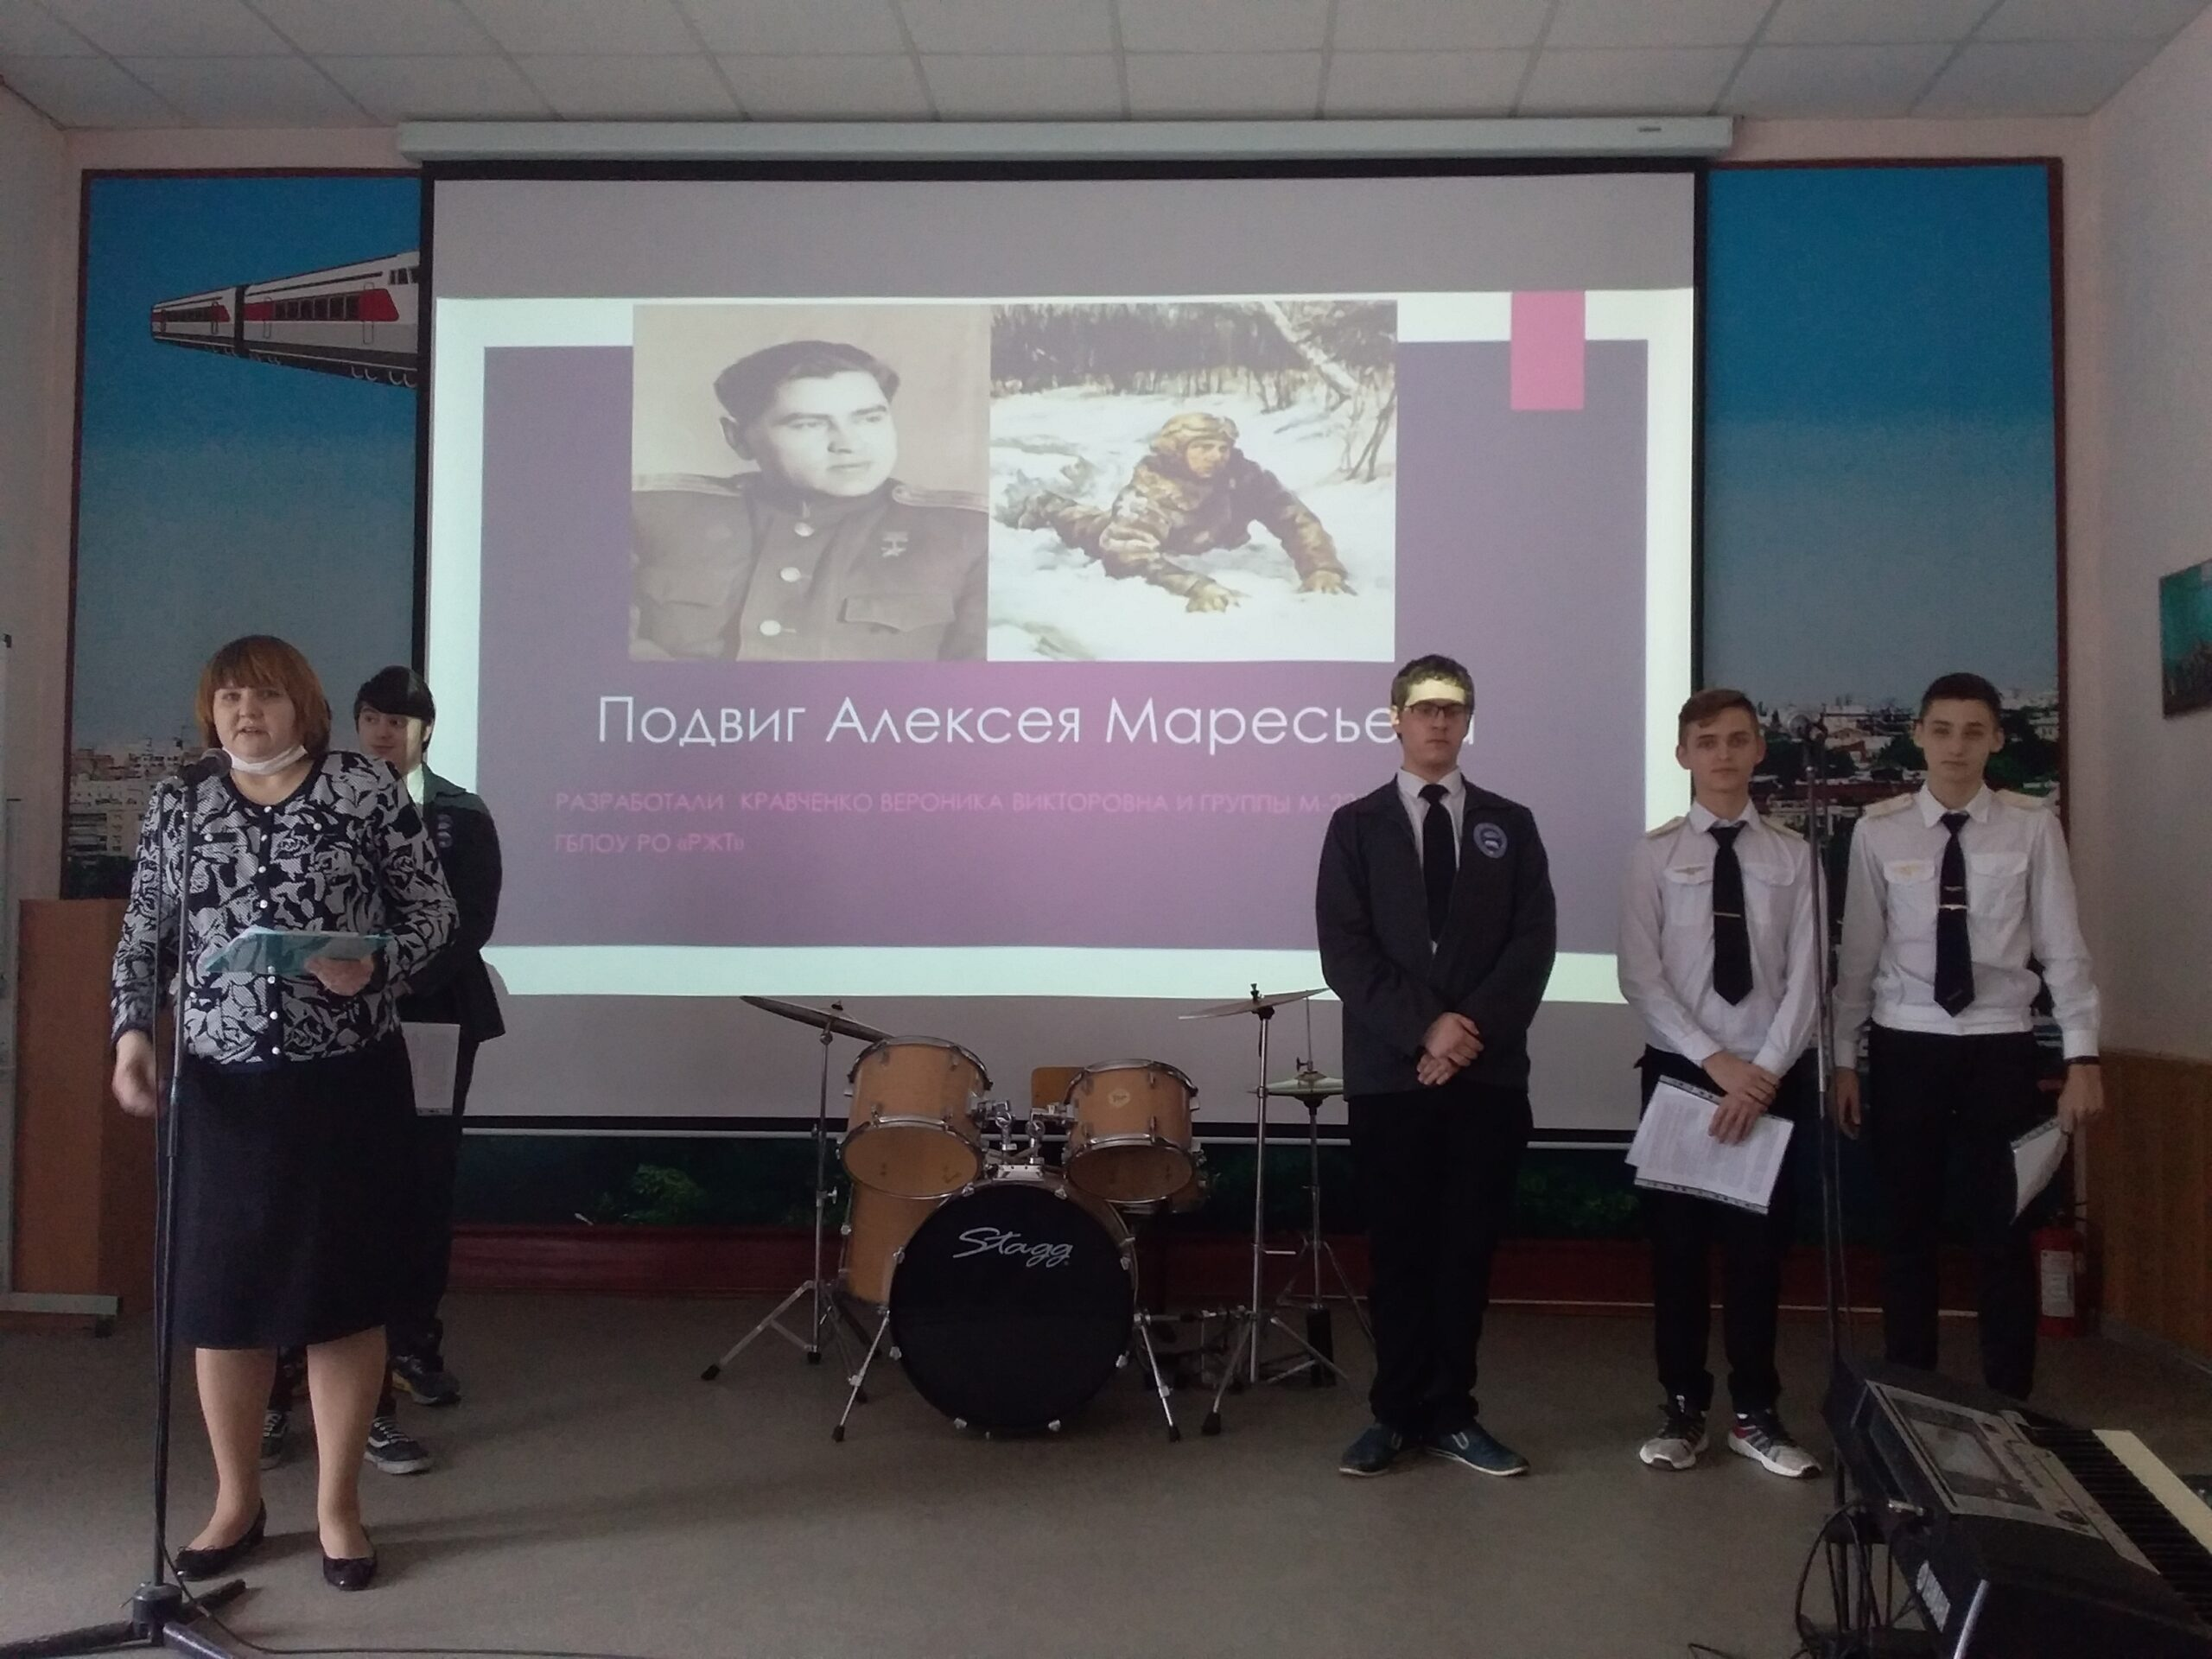 Подвиг Алексея Маресьева